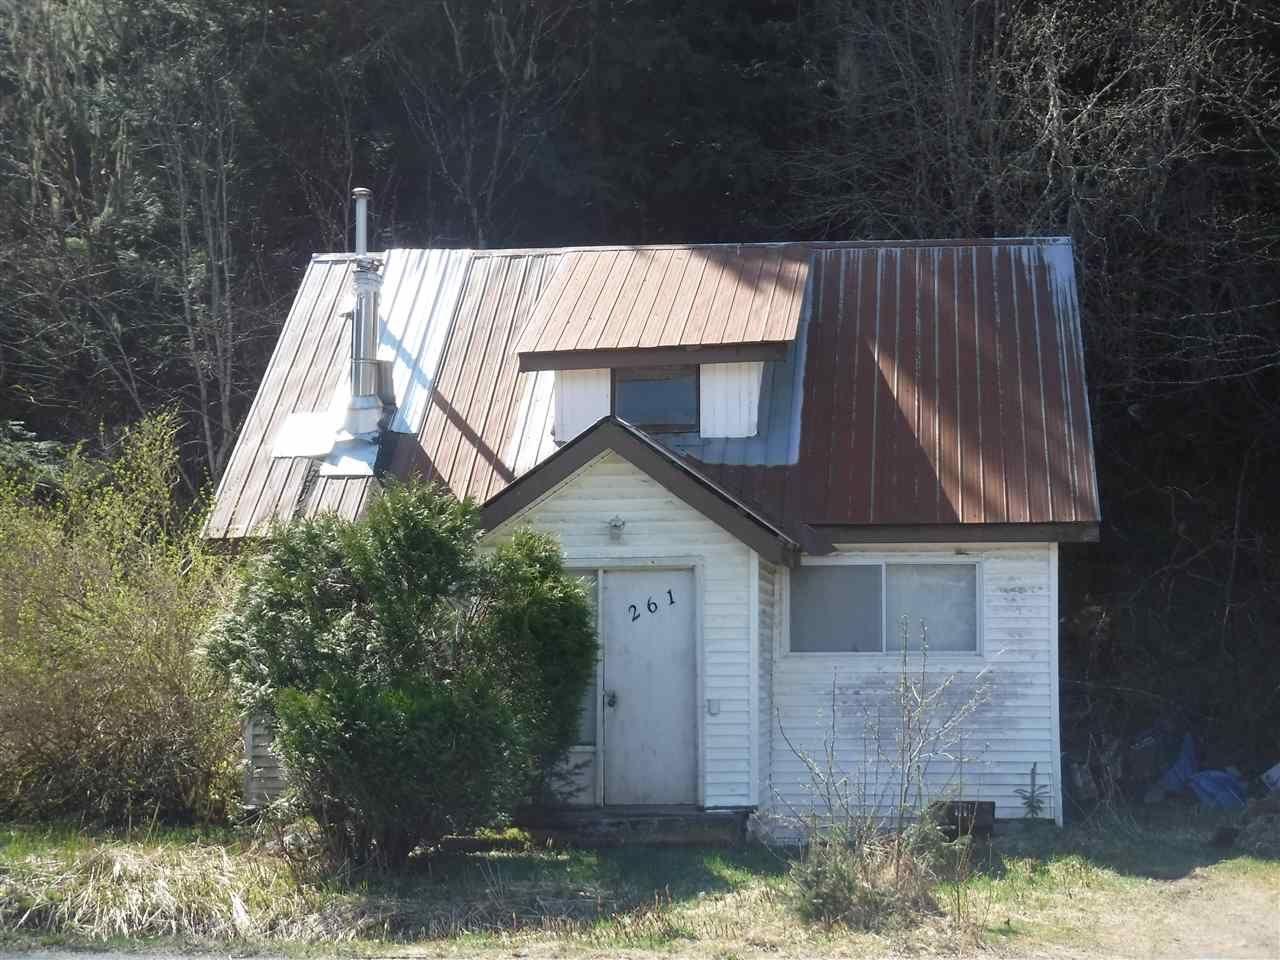 Main Photo: 261 MACKENZIE Highway in Bella Coola: Bella Coola/Hagensborg House for sale (Williams Lake (Zone 27))  : MLS®# R2567138